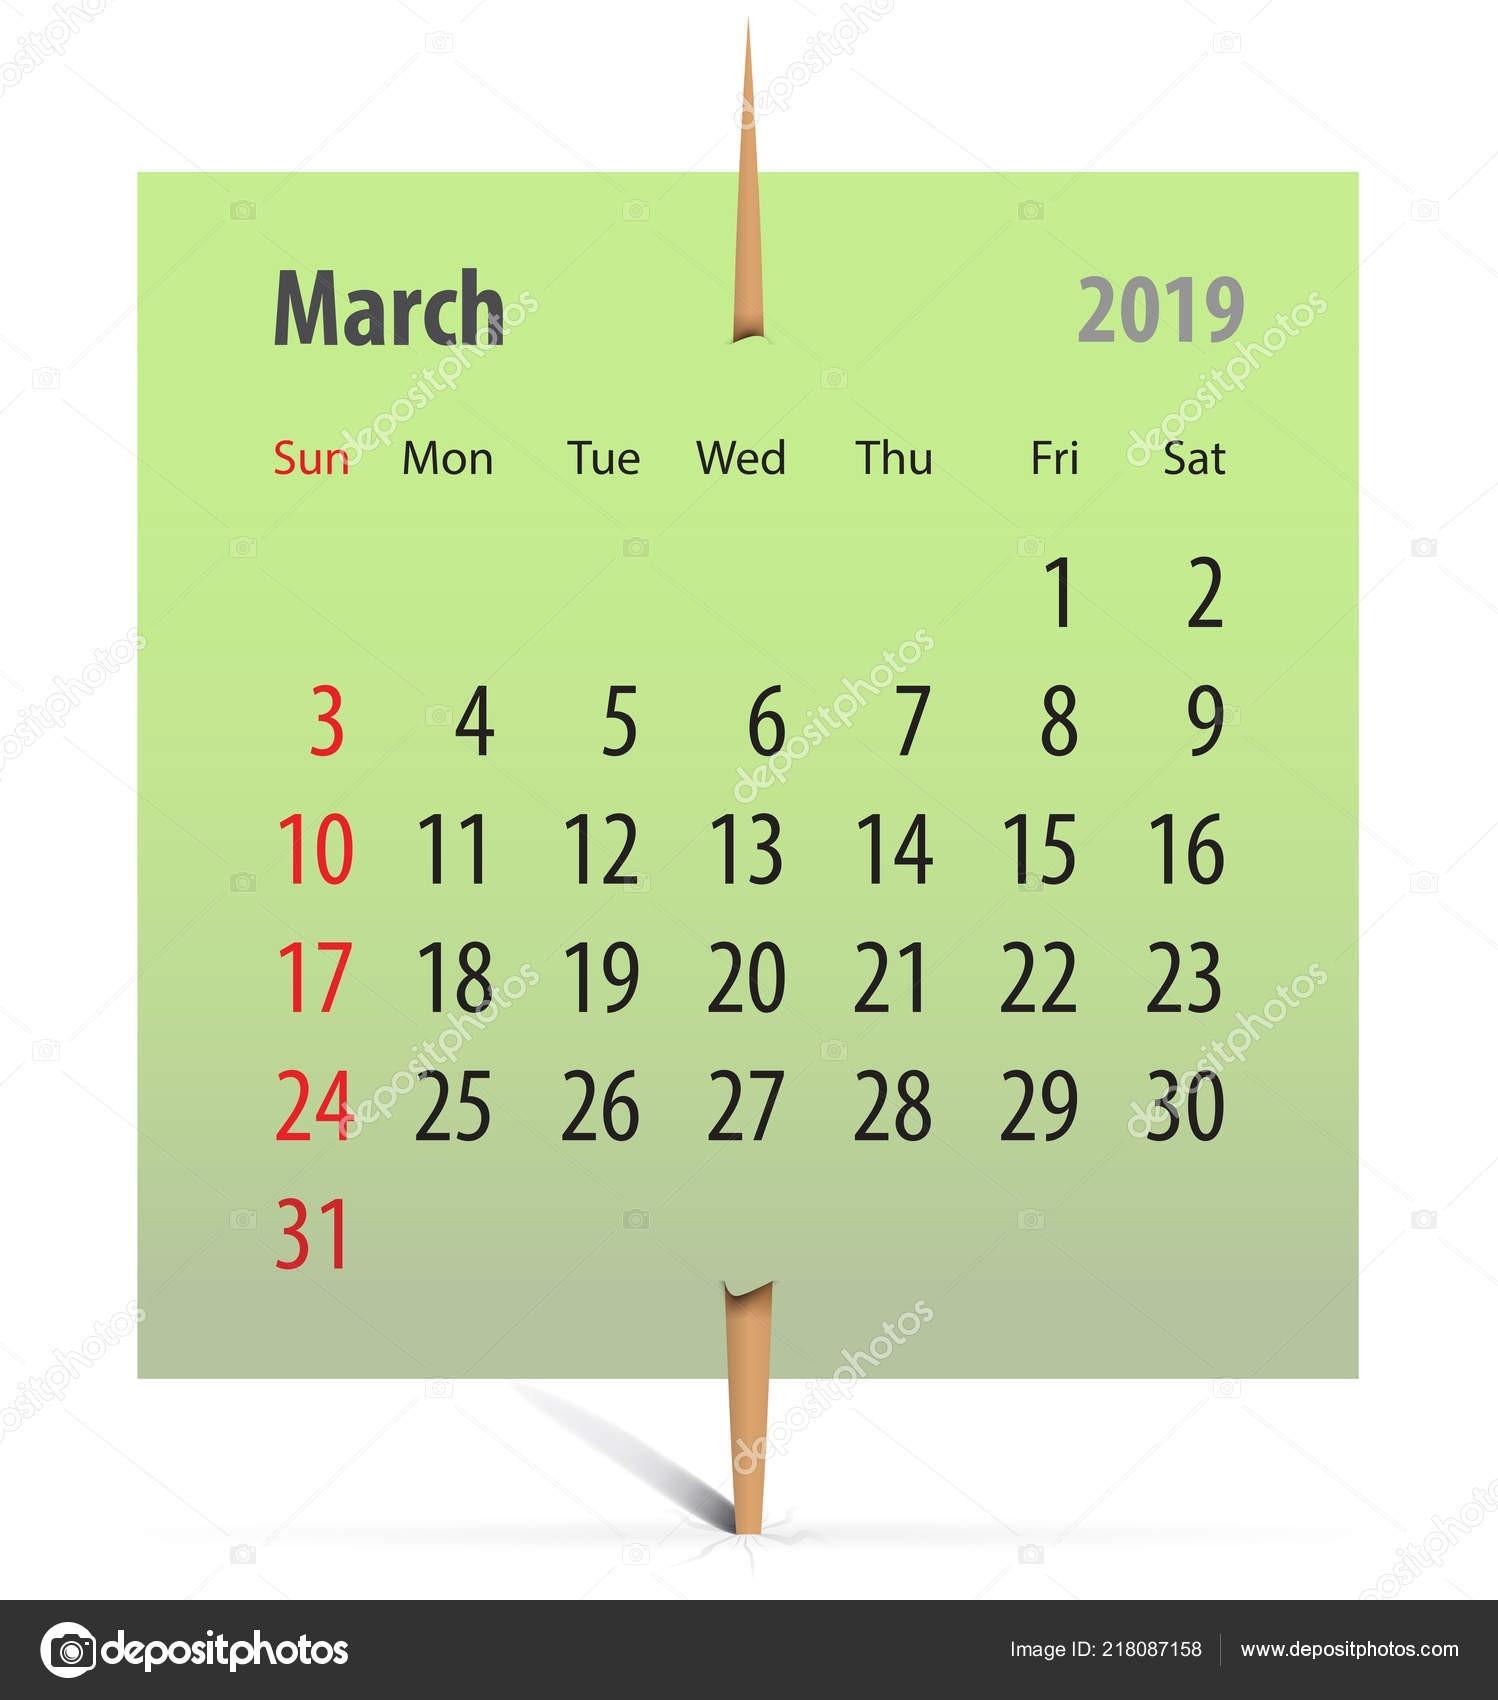 google calendar march 2019 mejores y mas novedosos kalendaac299 bac299ezen 2019 zelene nalepce pac299ipevnac29bne paratkem vektorove of google calendar march 2019